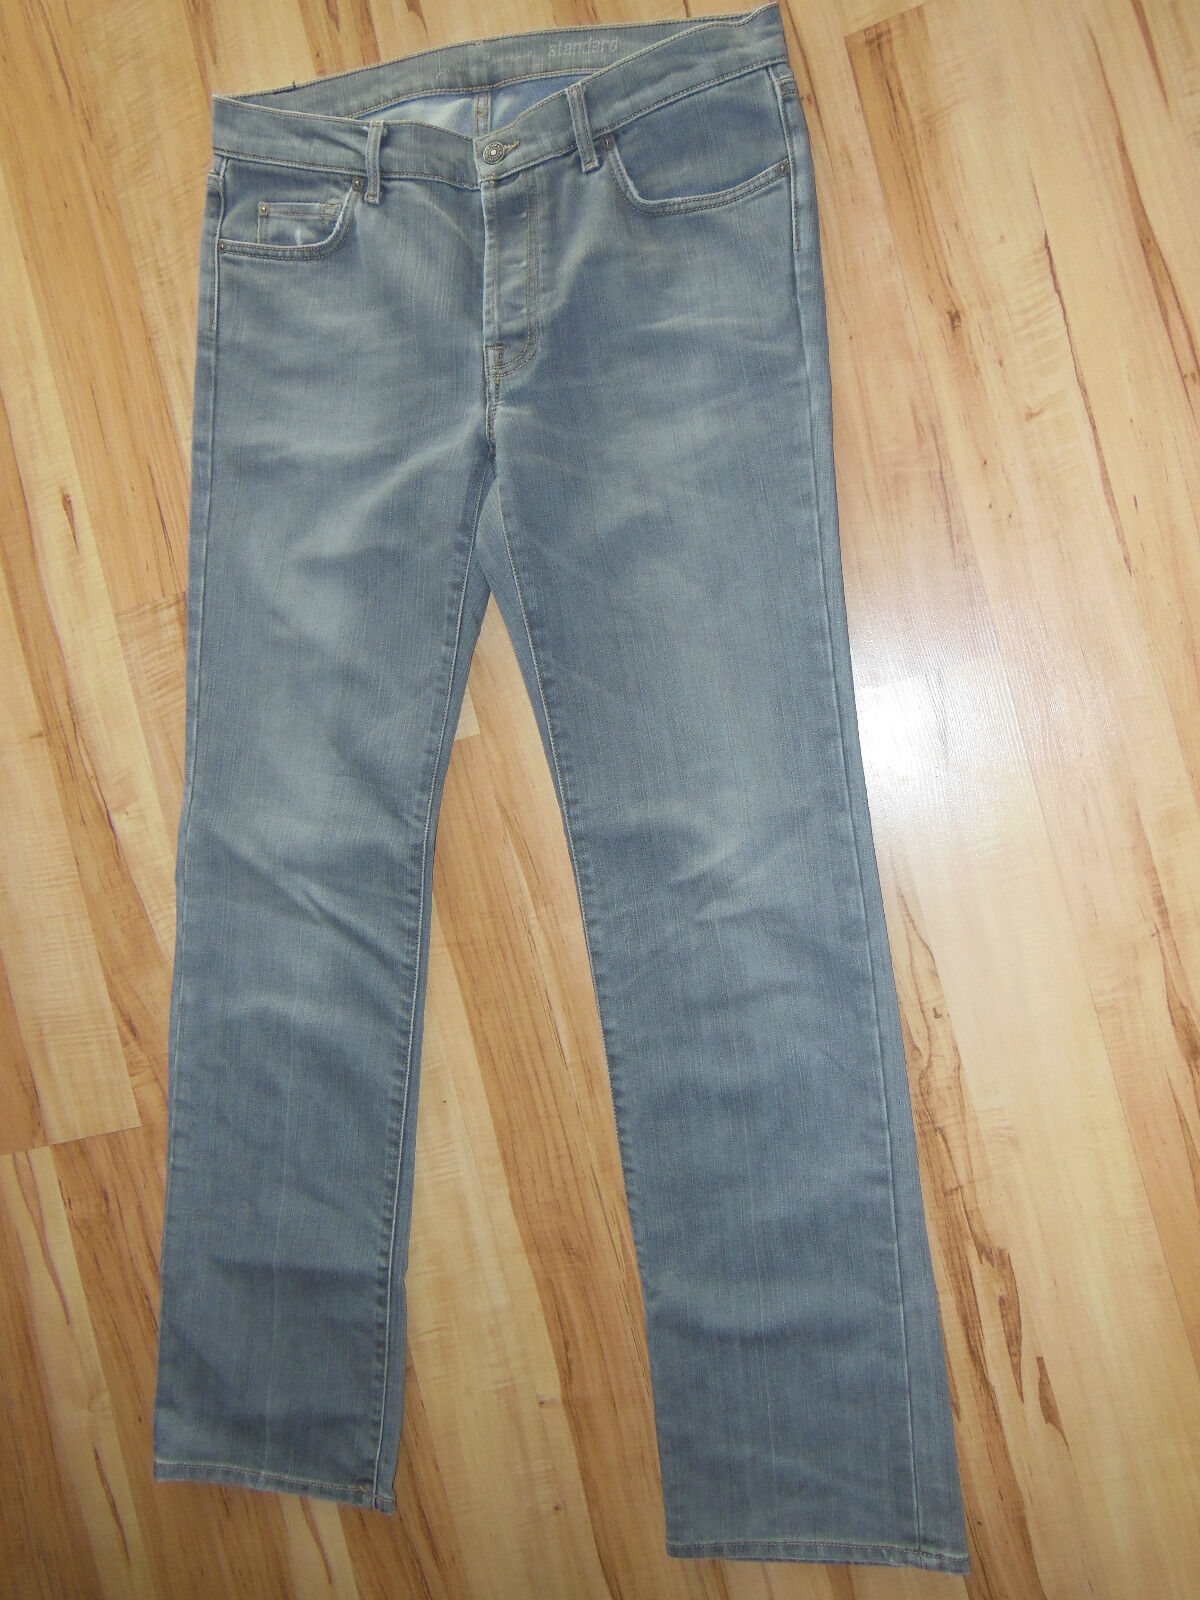 Mankind seven Jeans grau Gr. 34 TOP wie neu